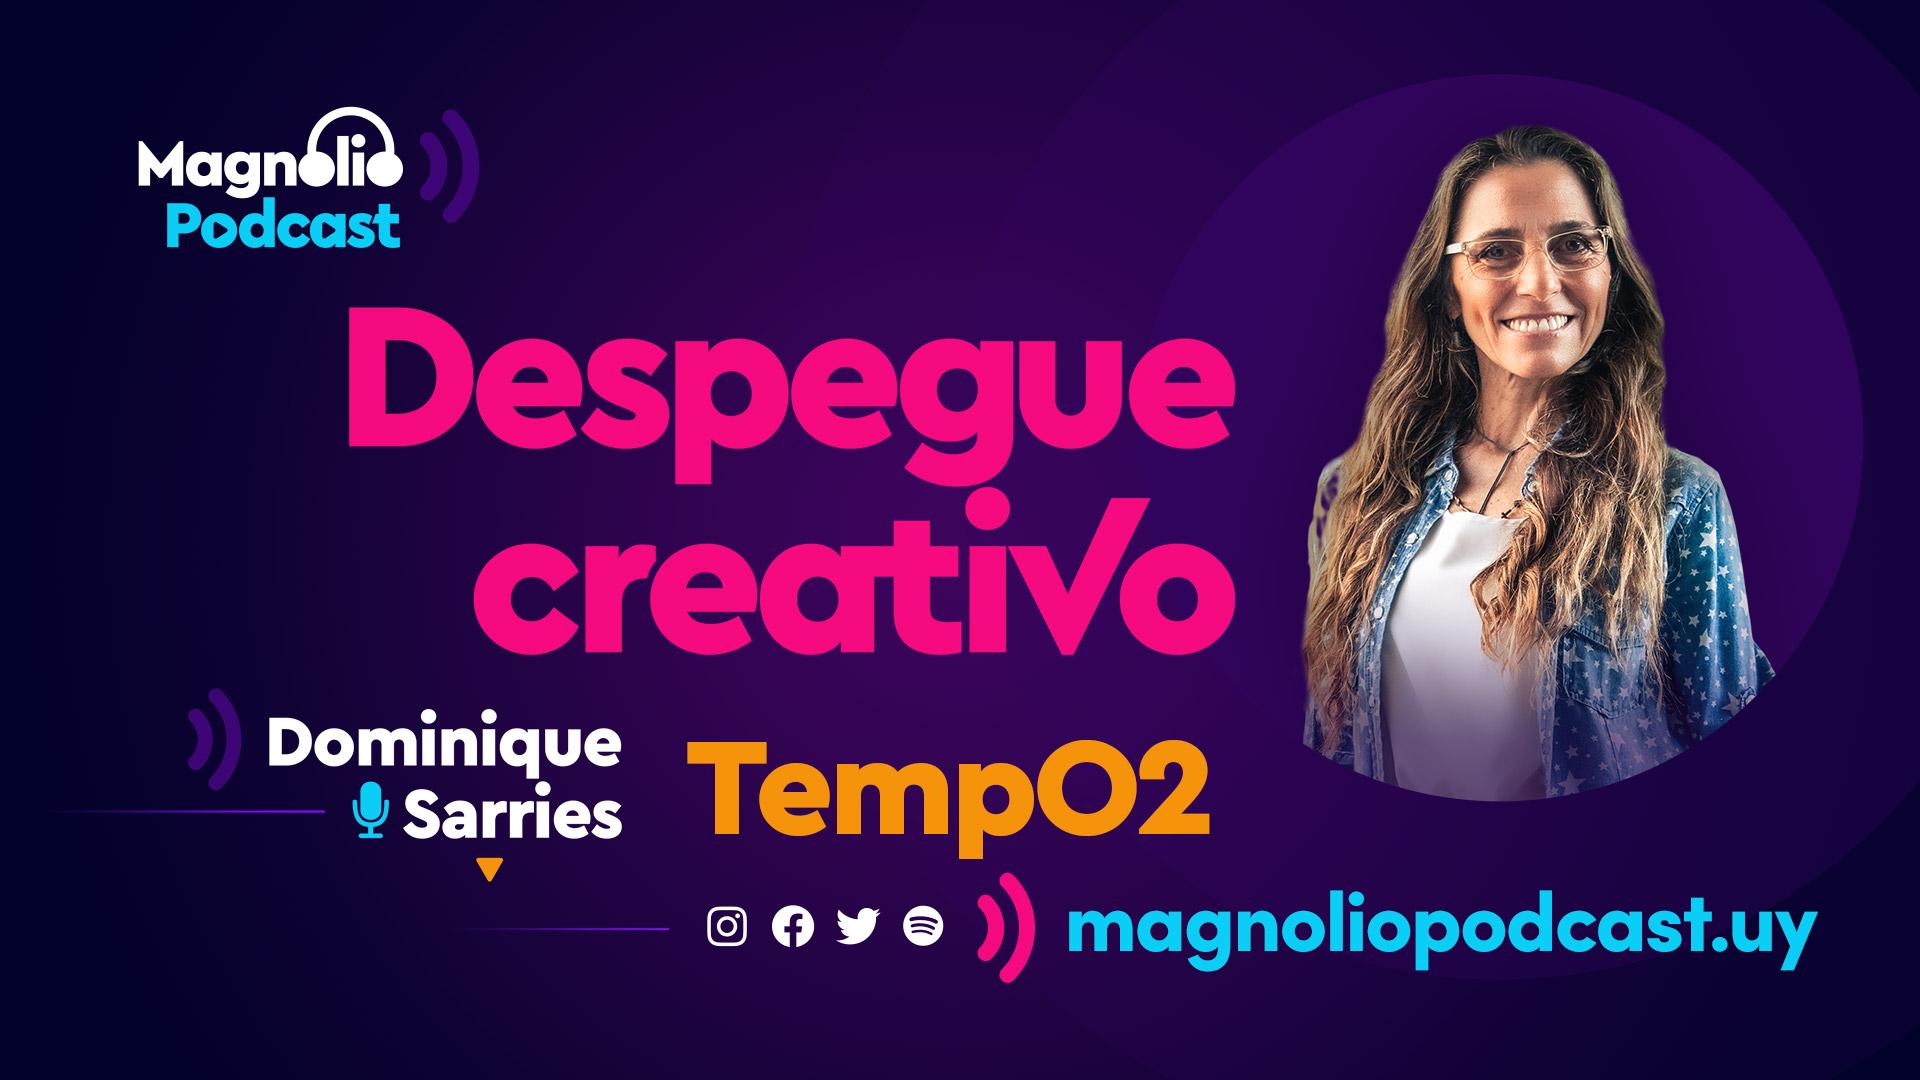 Despegue creativo - Dominique Sarries